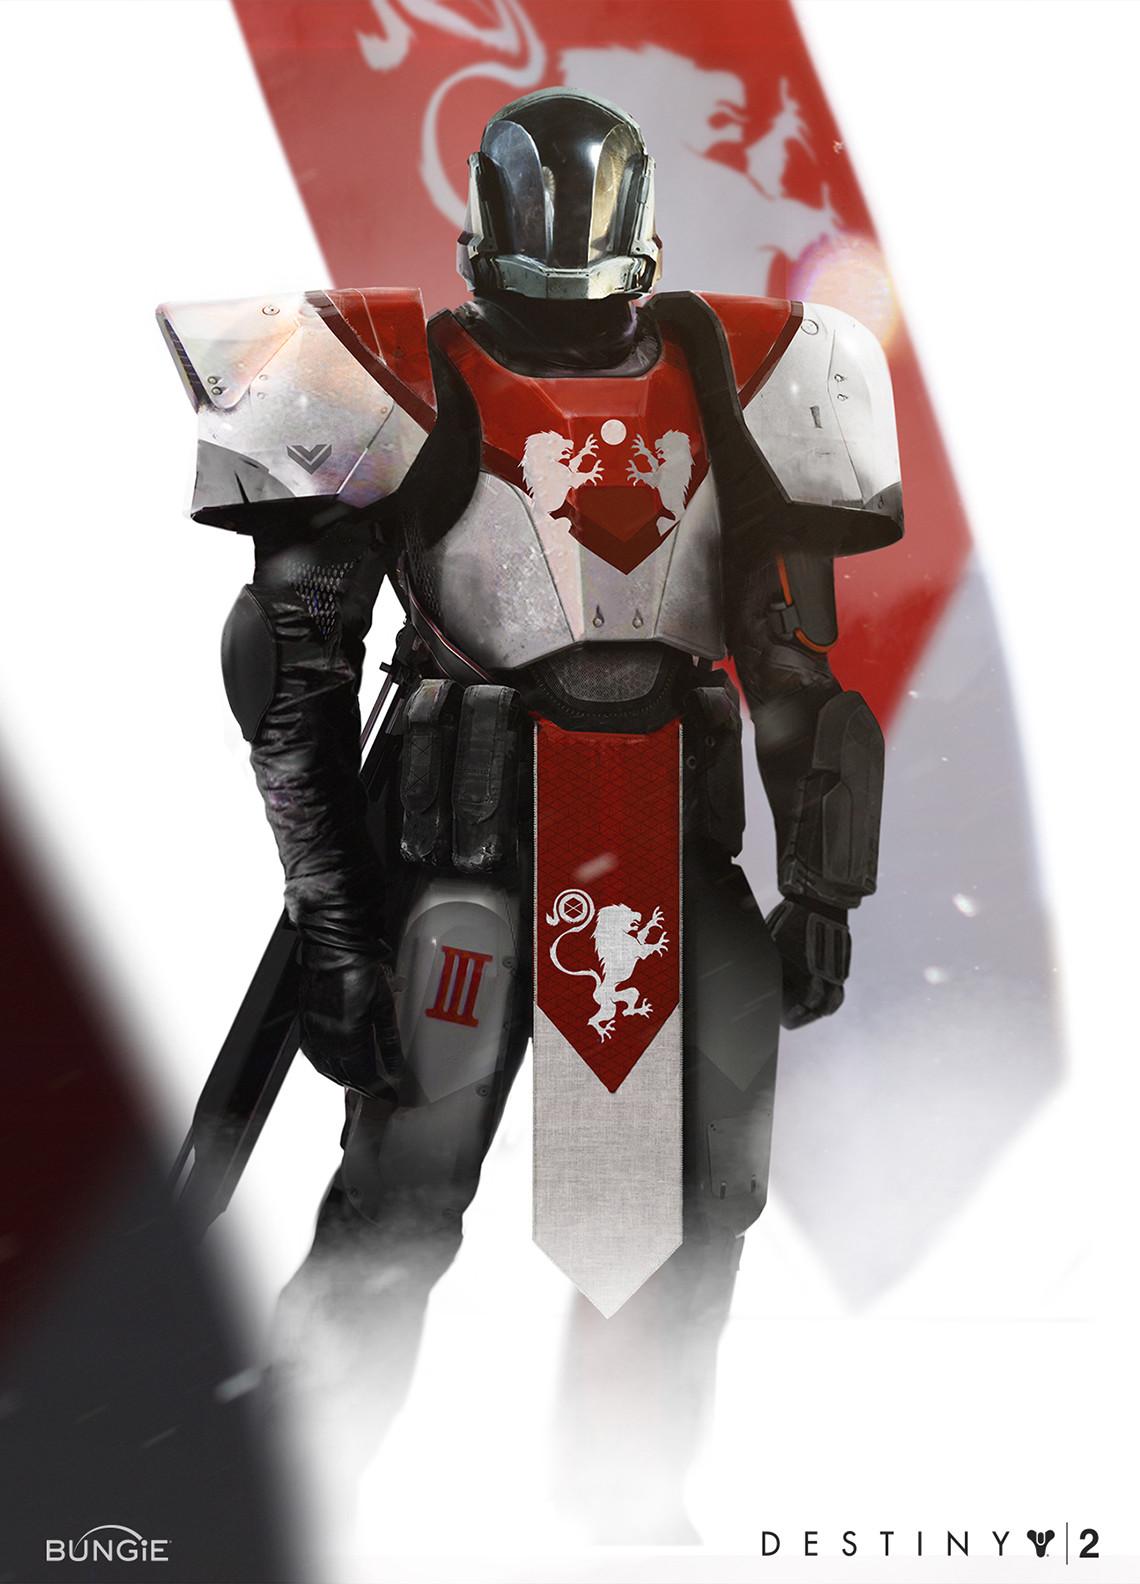 Joseph cross jc titan class